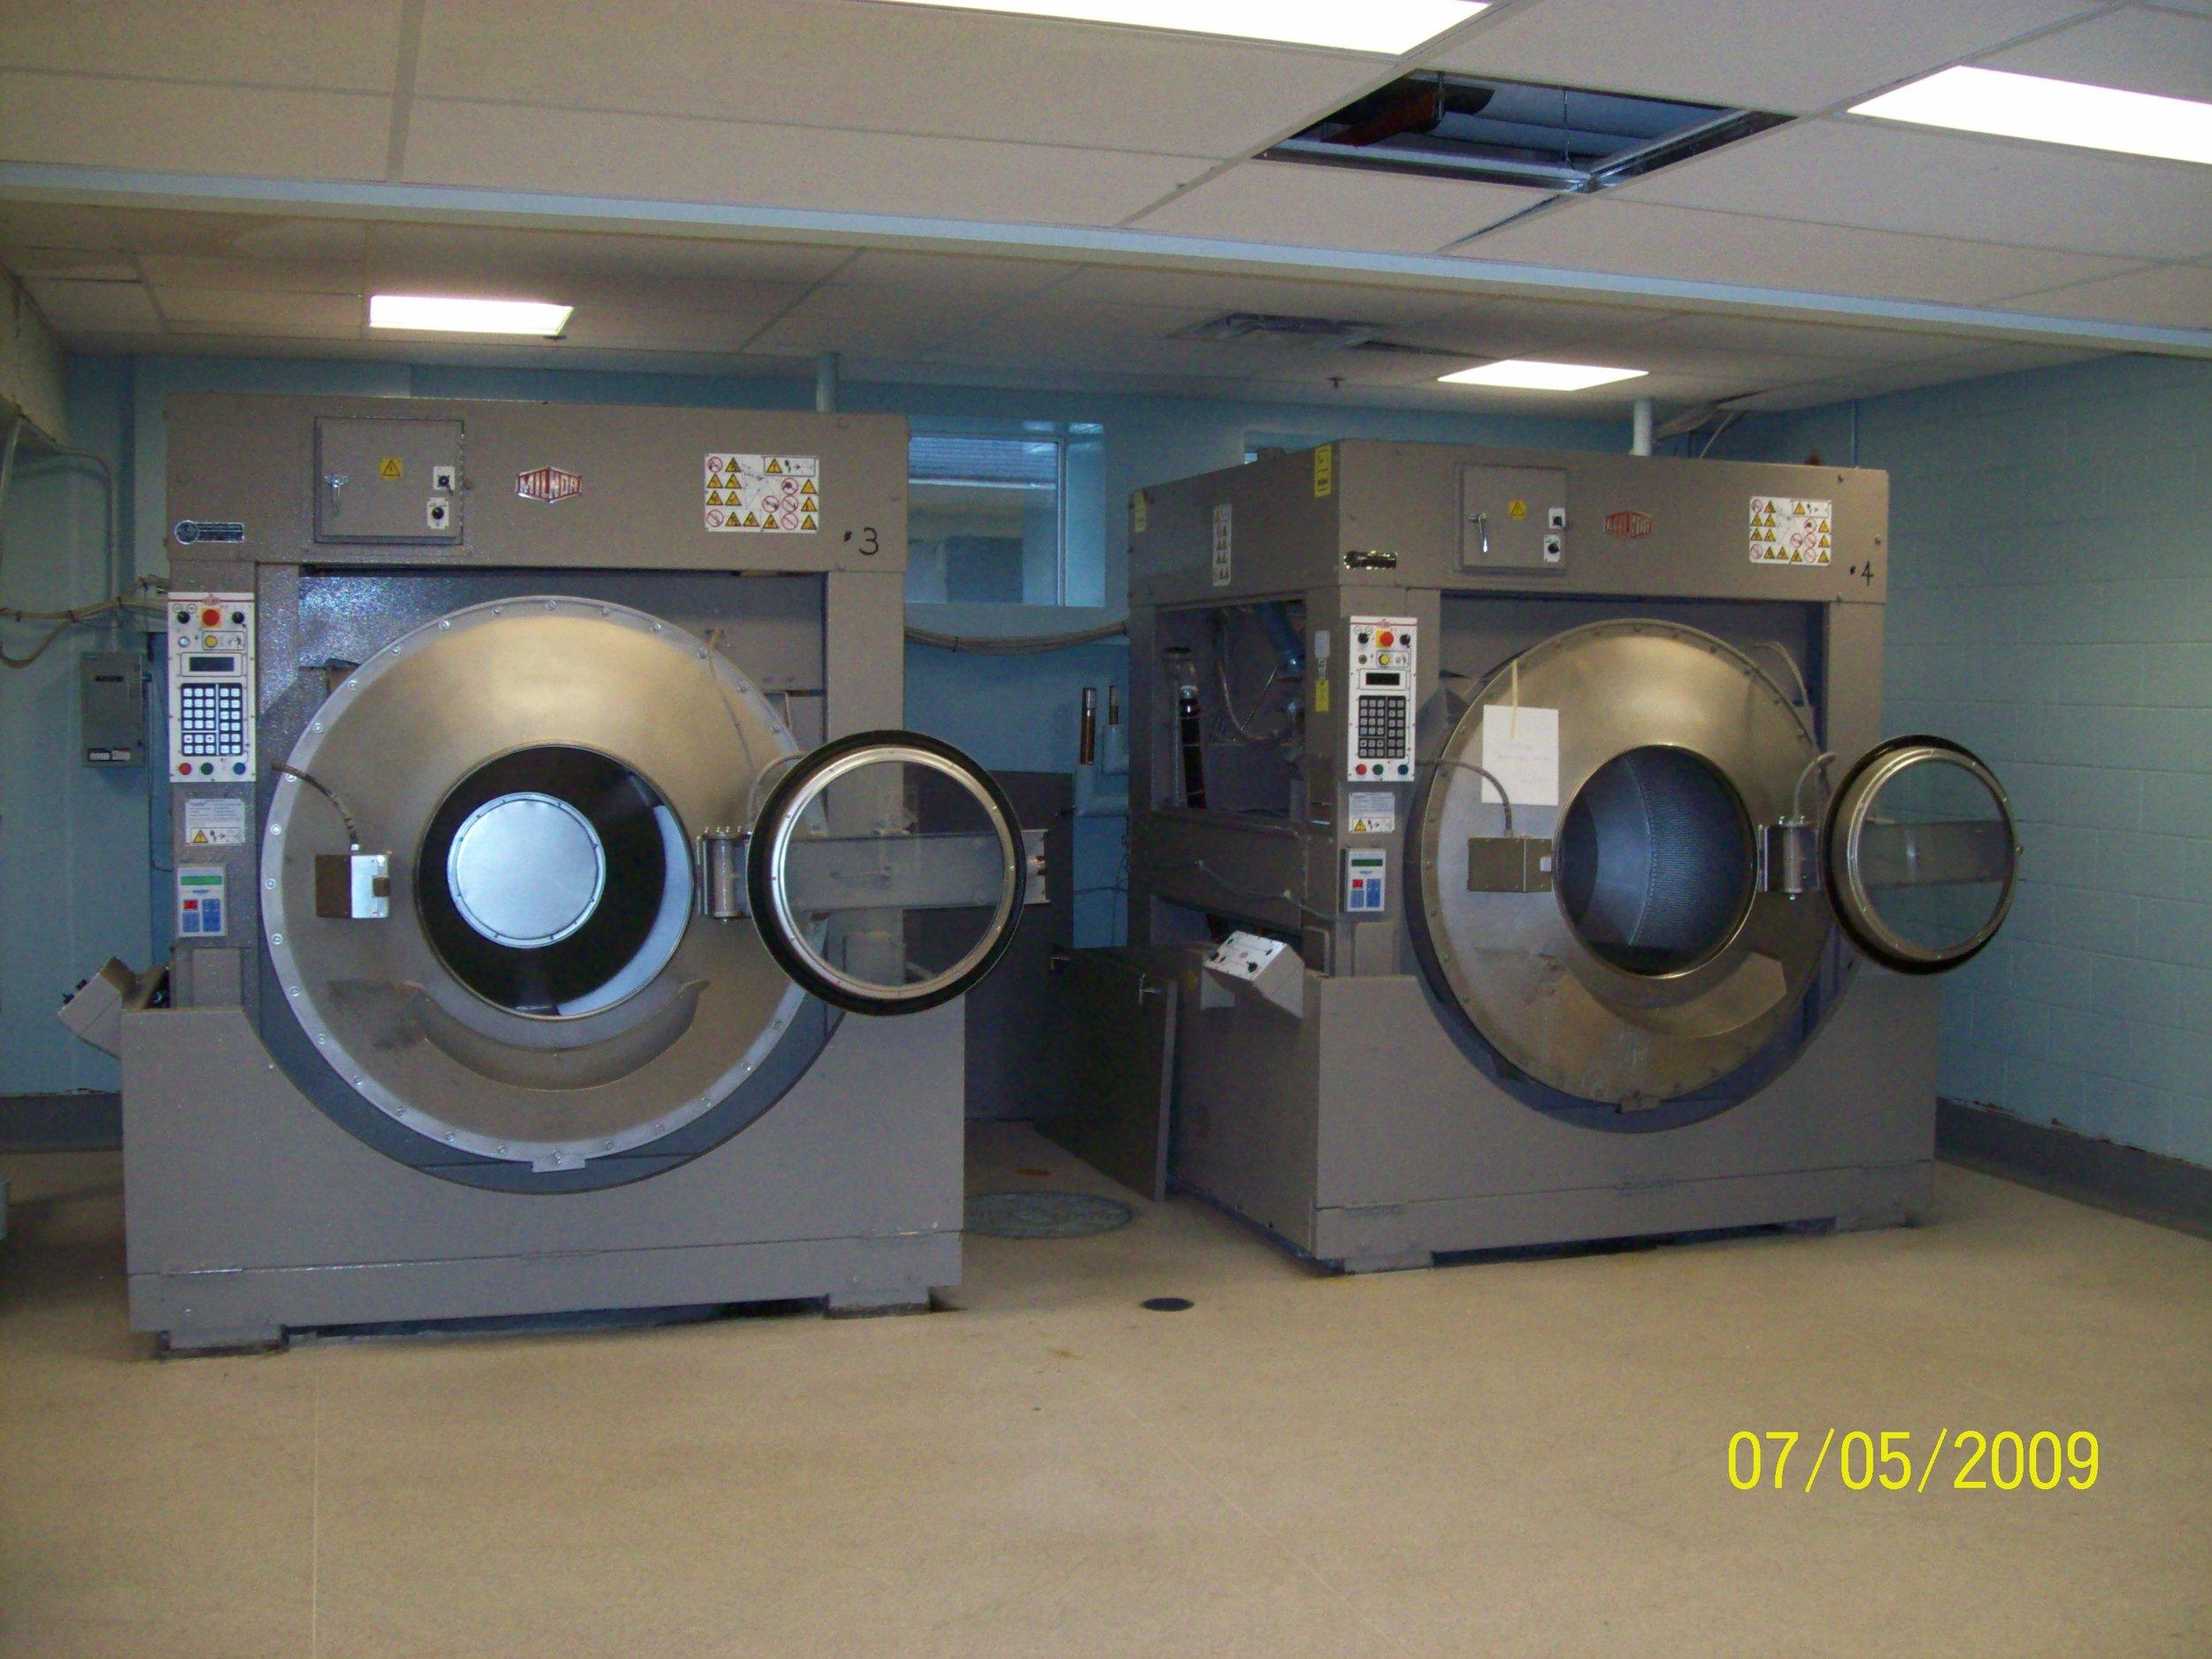 James Payton Hospital - Milnor Washers.jpg